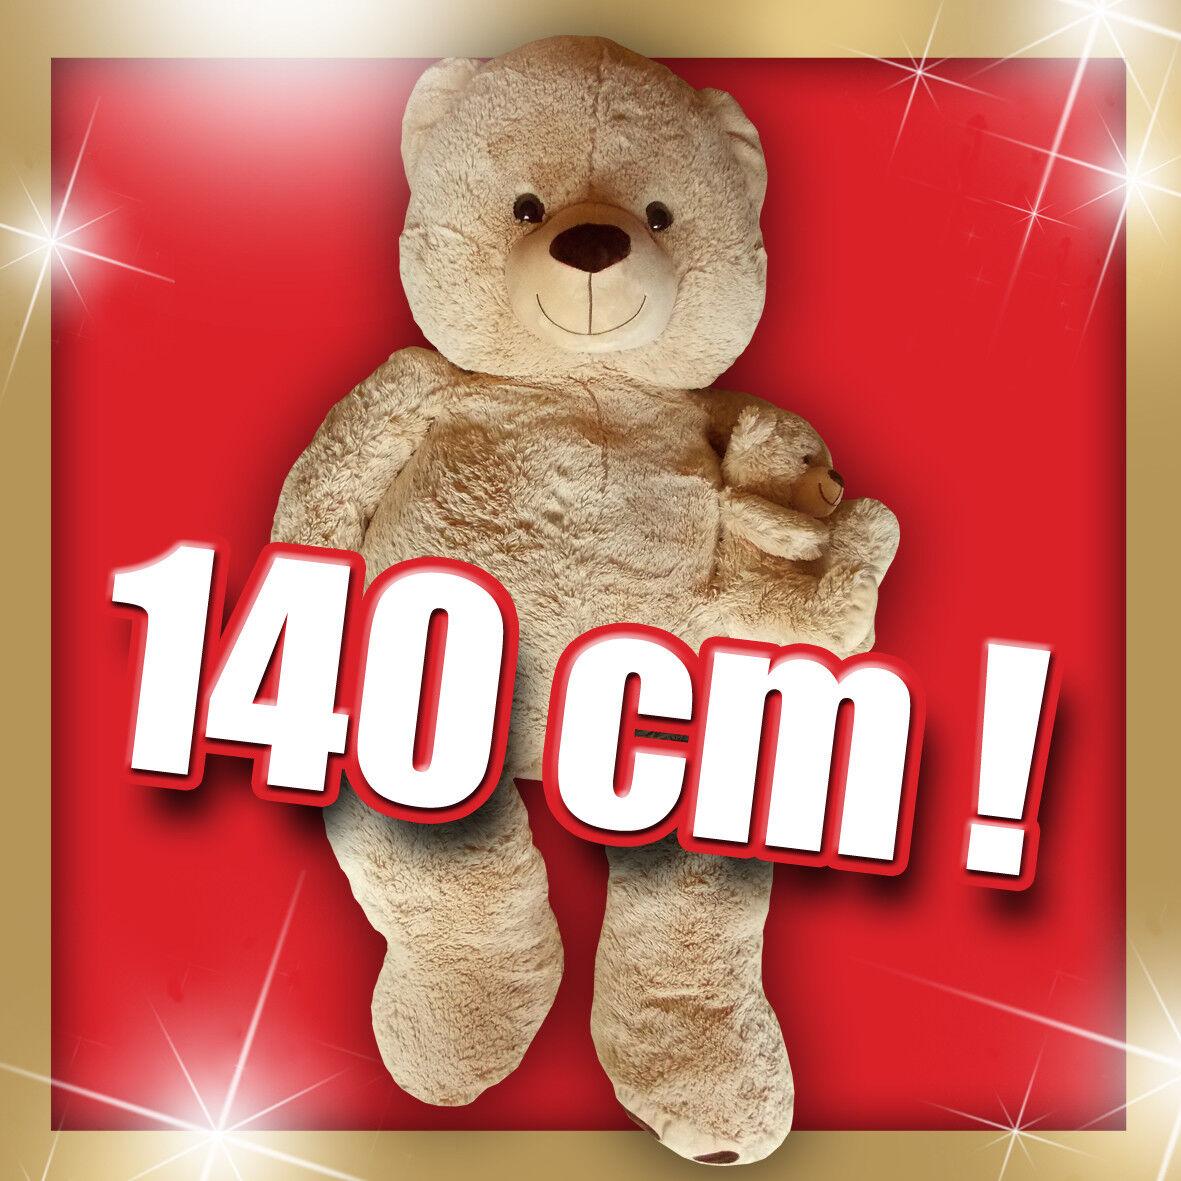 .··.· Teddy XXL (140 cm ) mit Teddykind   Unbespielt   total süß  -)